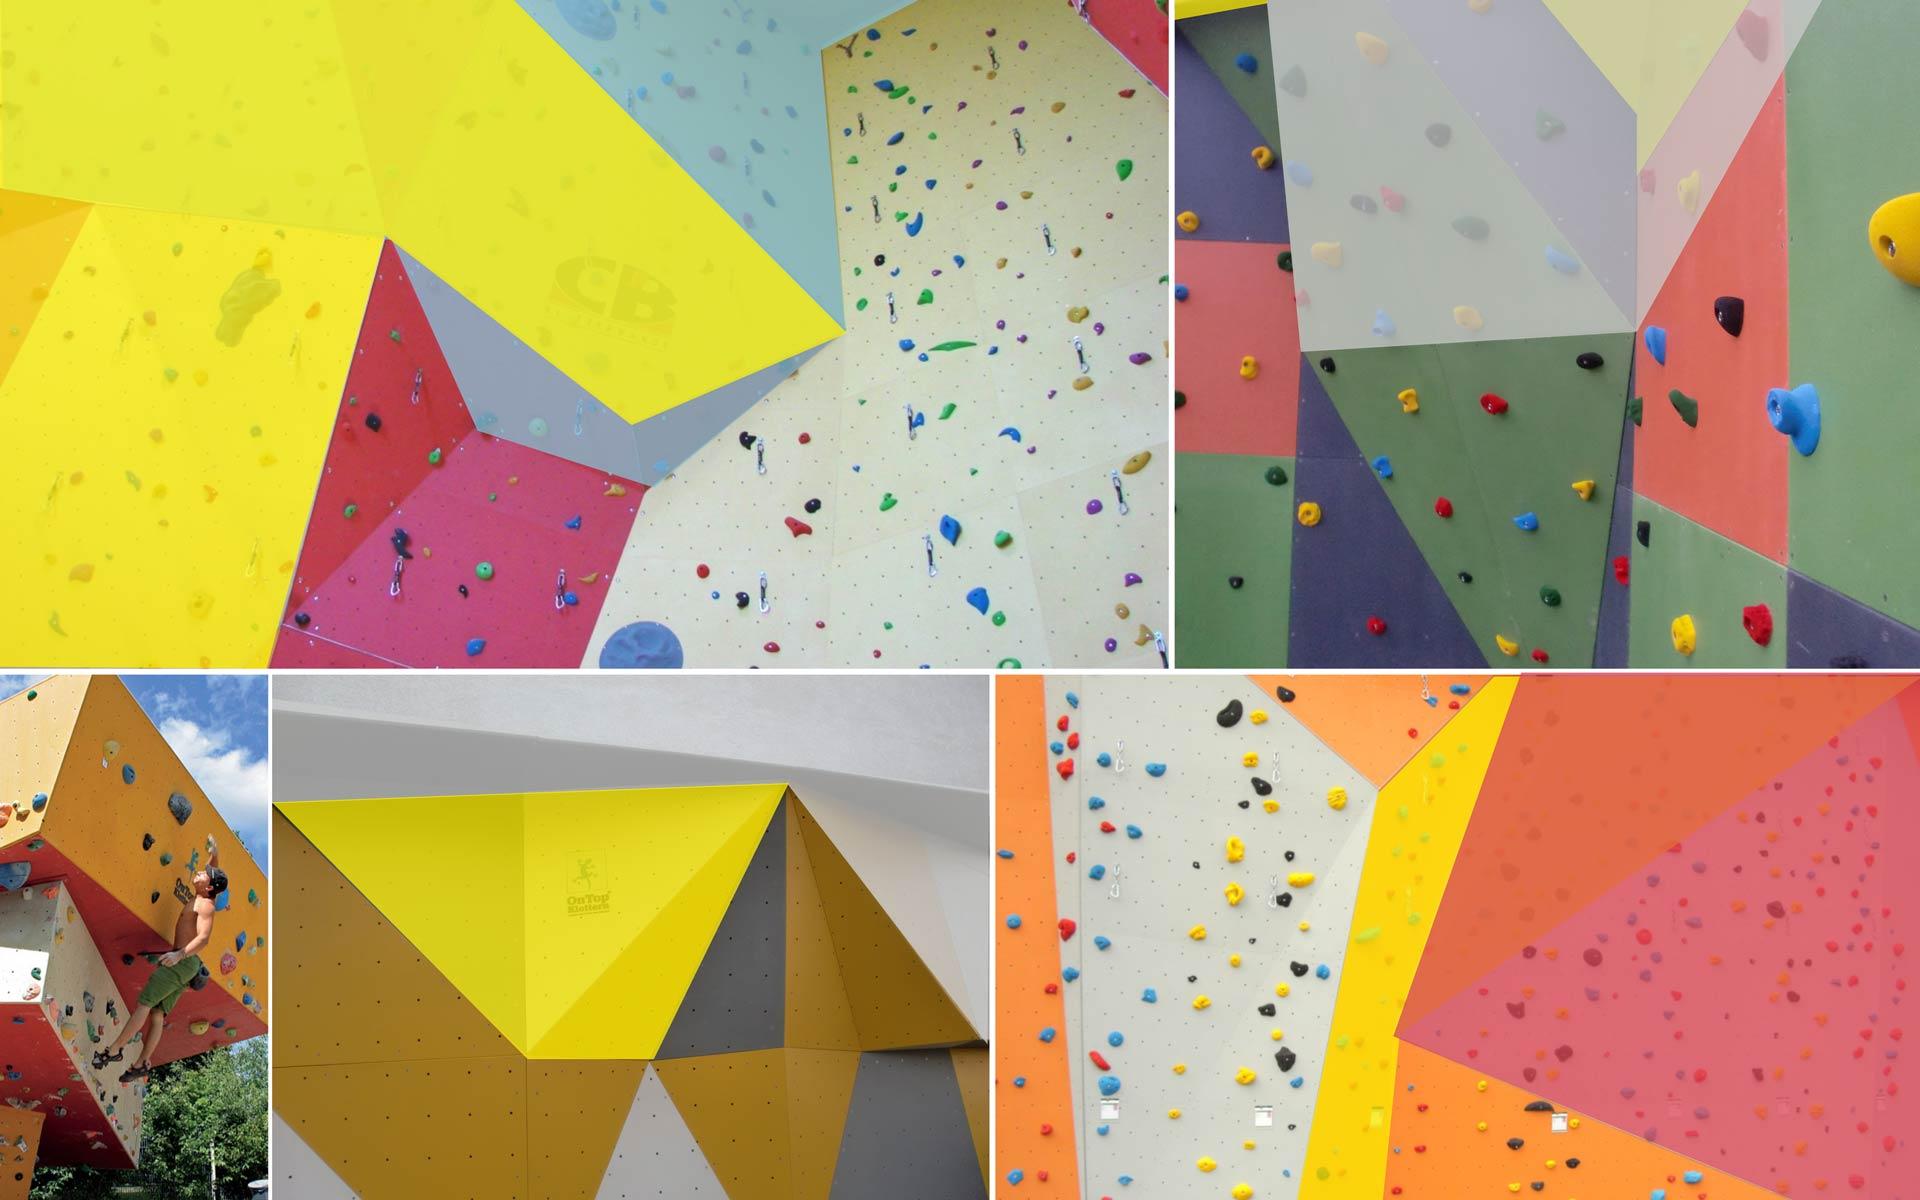 Bergstation Corporate Design, Konzept, Farbflächen als Gestaltungselement